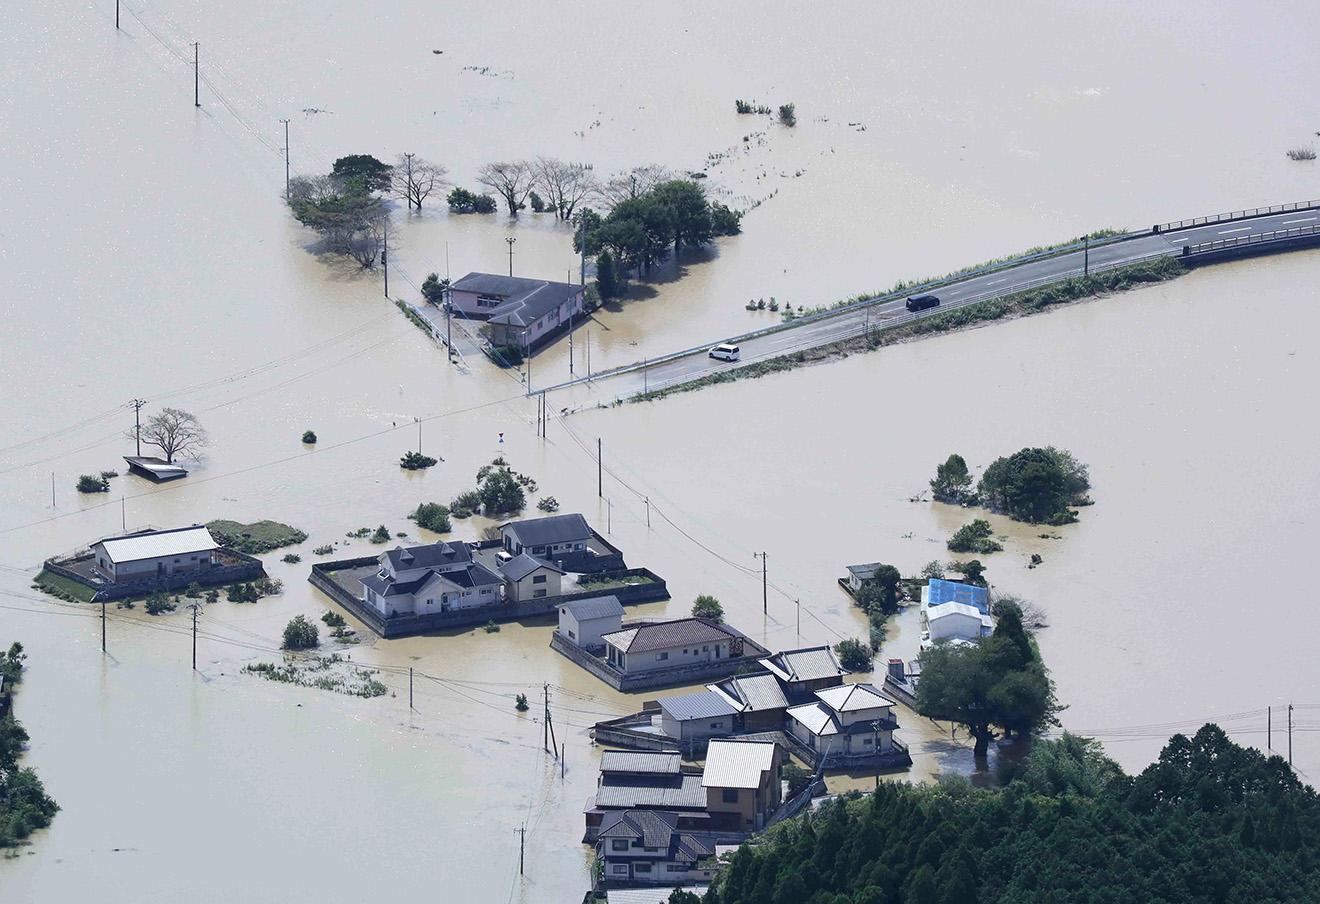 Последствия тайфуна в городе Набеока. Япония, 20 сентября 2016 года. Фото: Ichiro Ohara / AP / East News